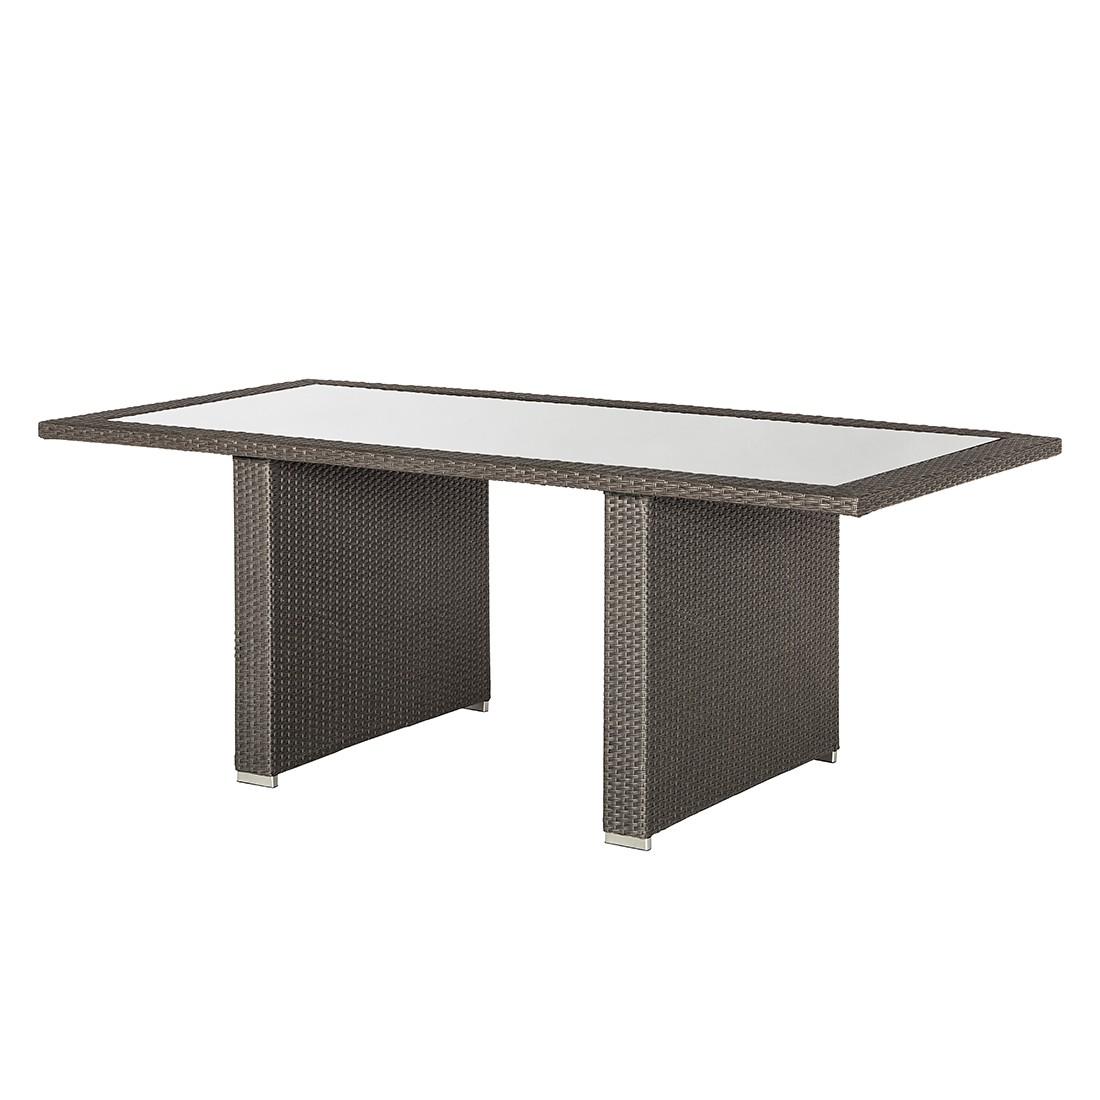 Table de jardin Pavona - Polyrotin gris, Fredriks